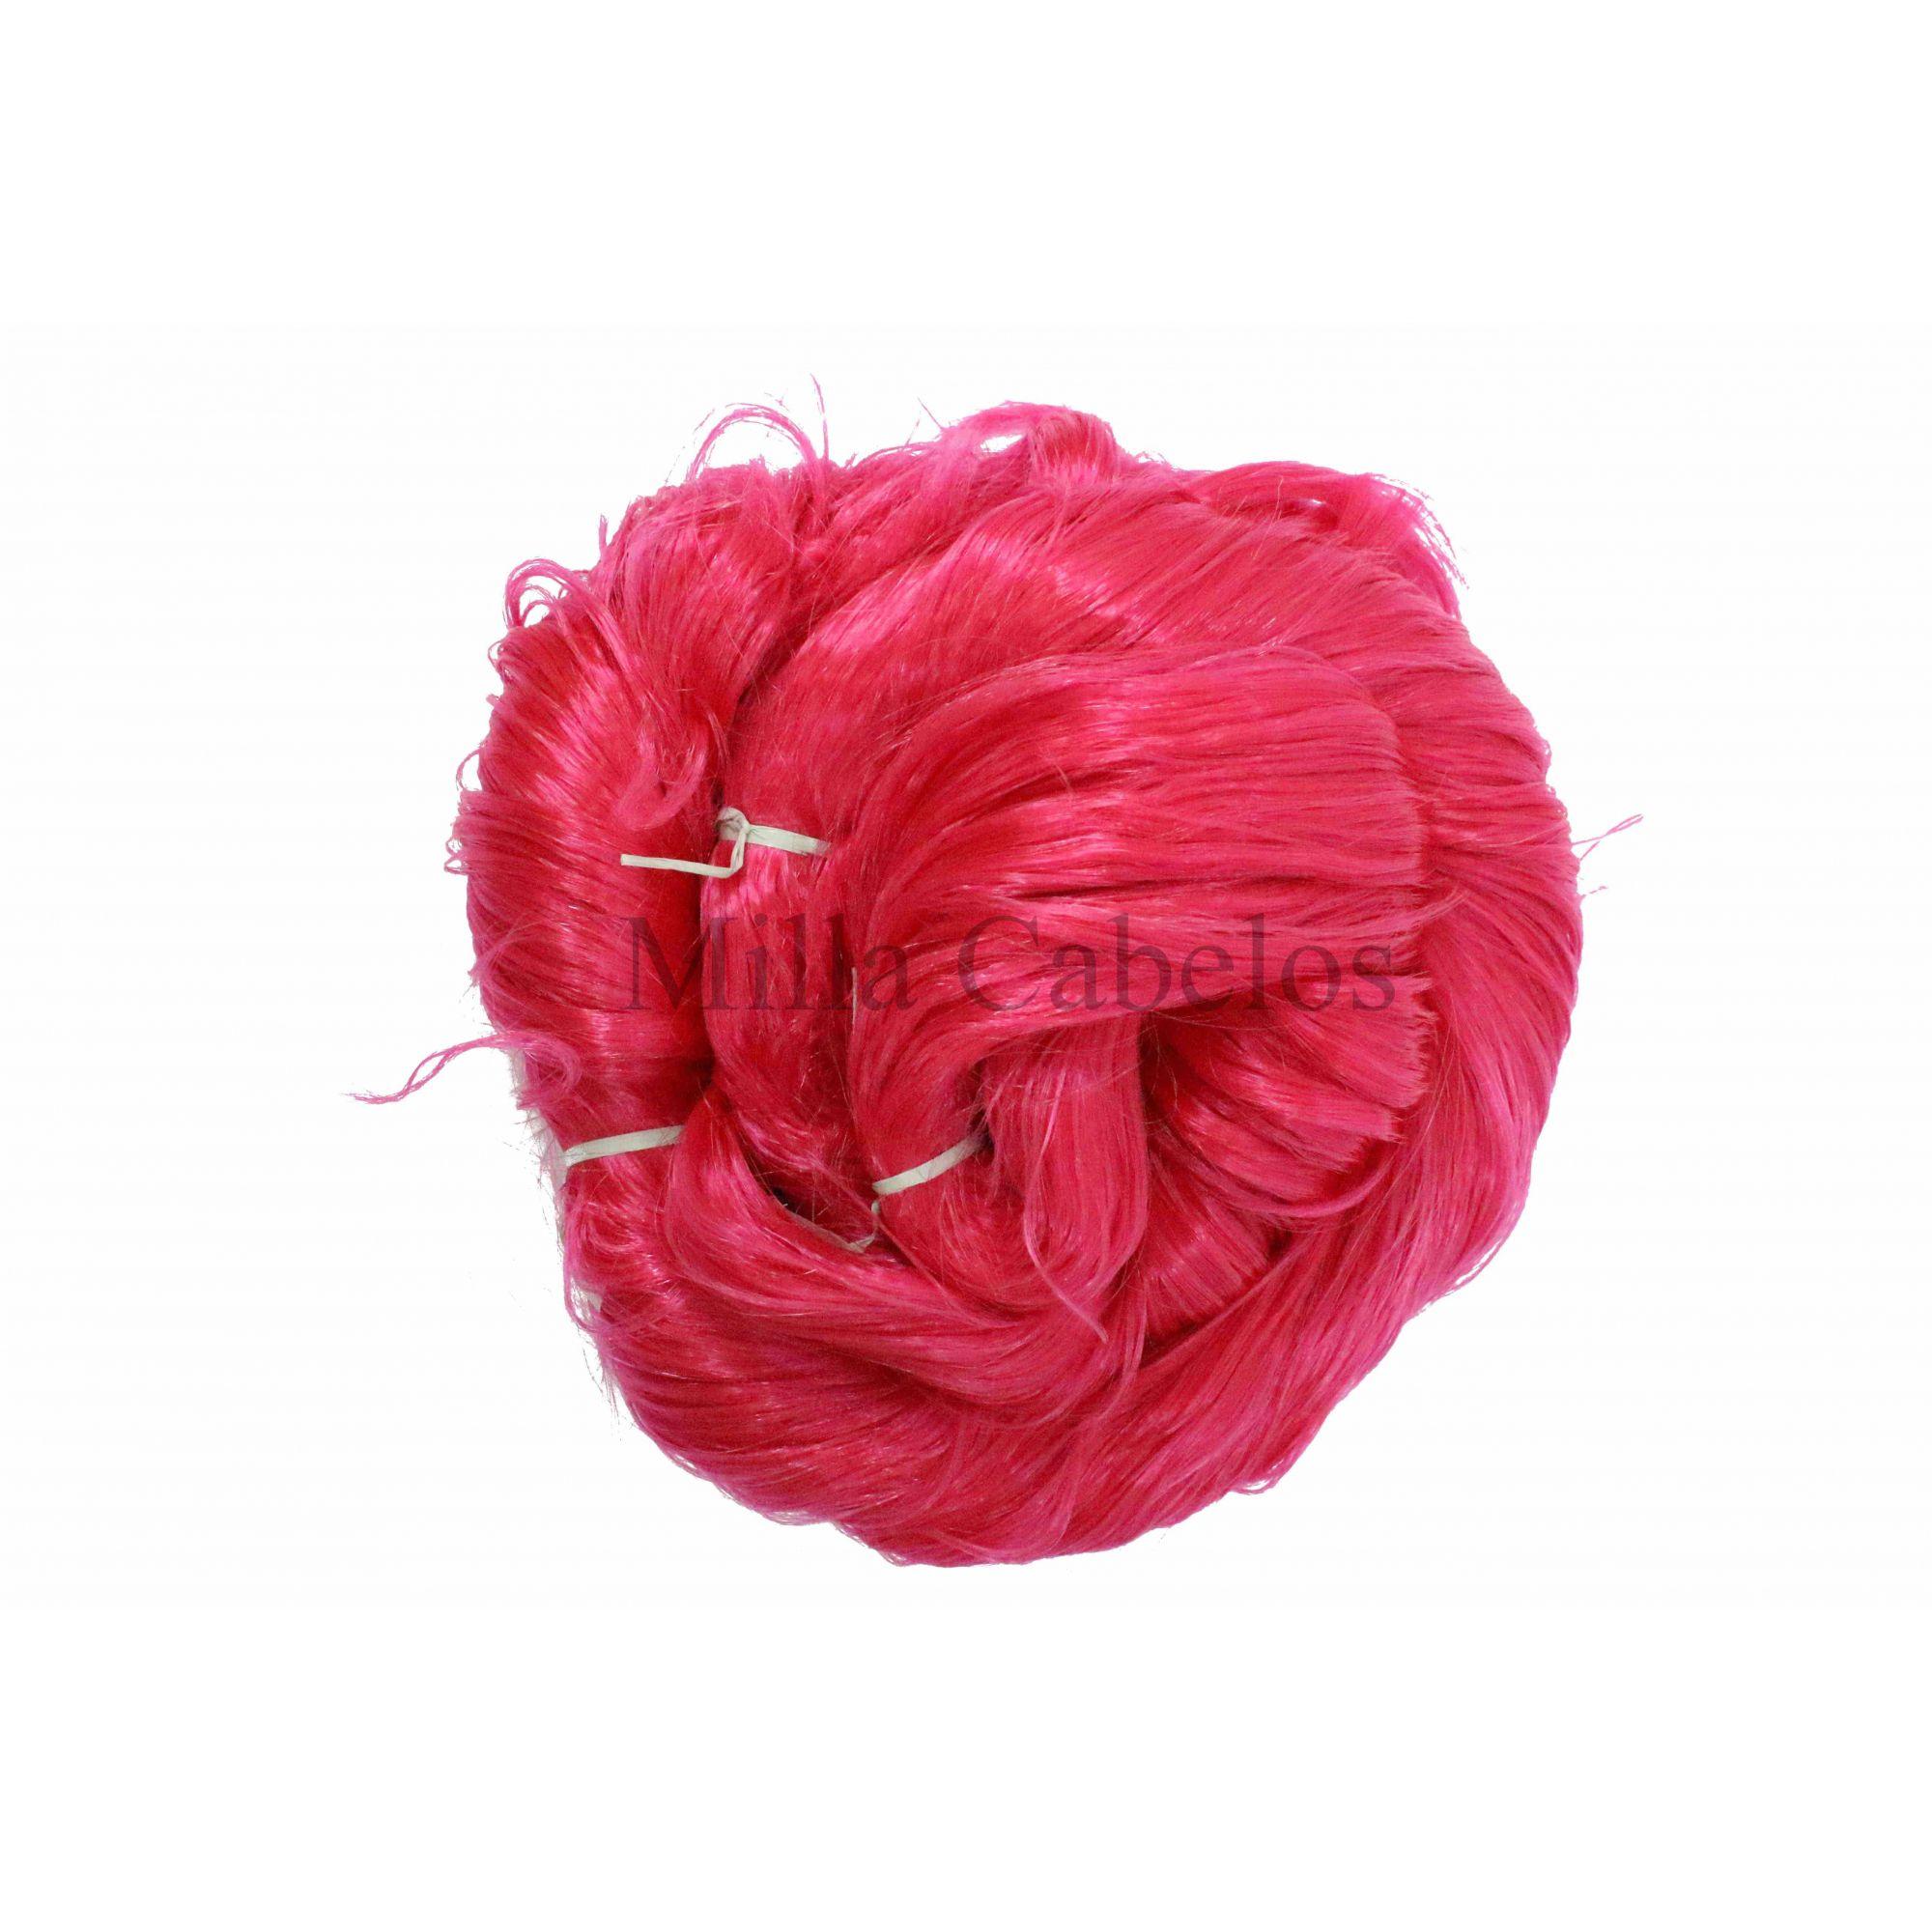 Cabelo Sintético - Fio de Fibra Nacional - Cor: Rosa Pink